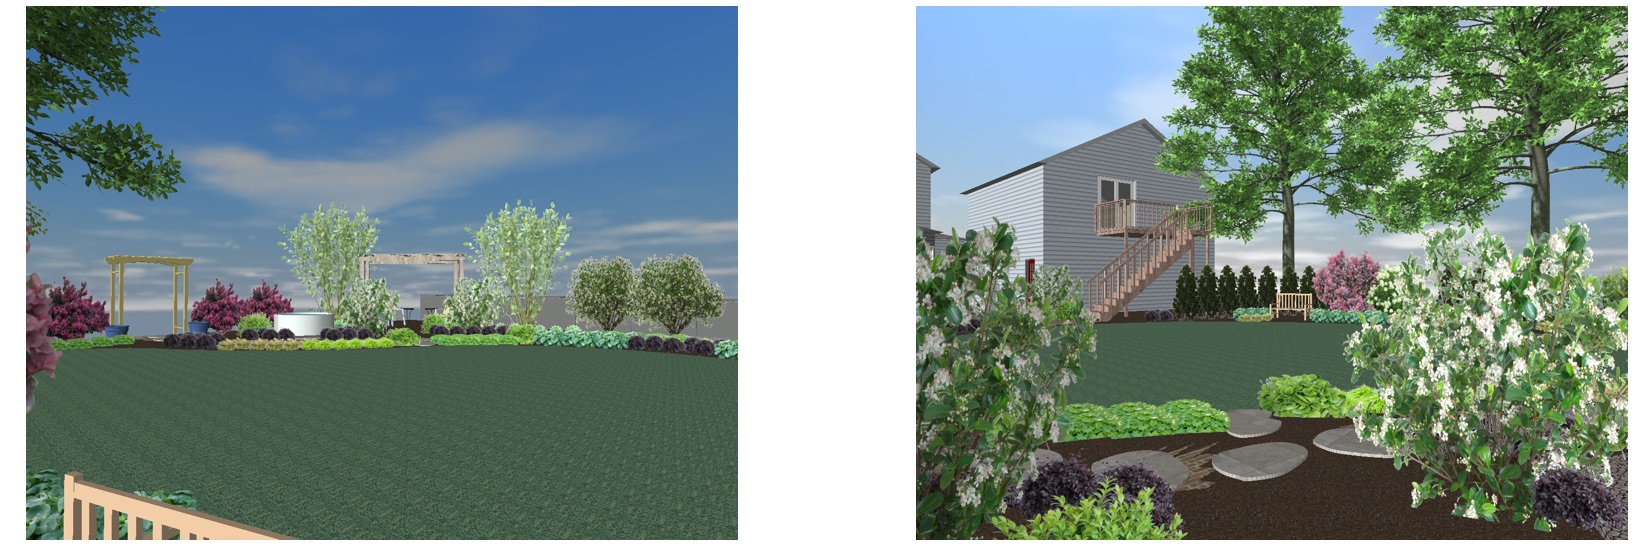 Ames-Iowa-Landscape-Master-Plan-Backyard-Landscaping-Red-Fern-Landscape-Design